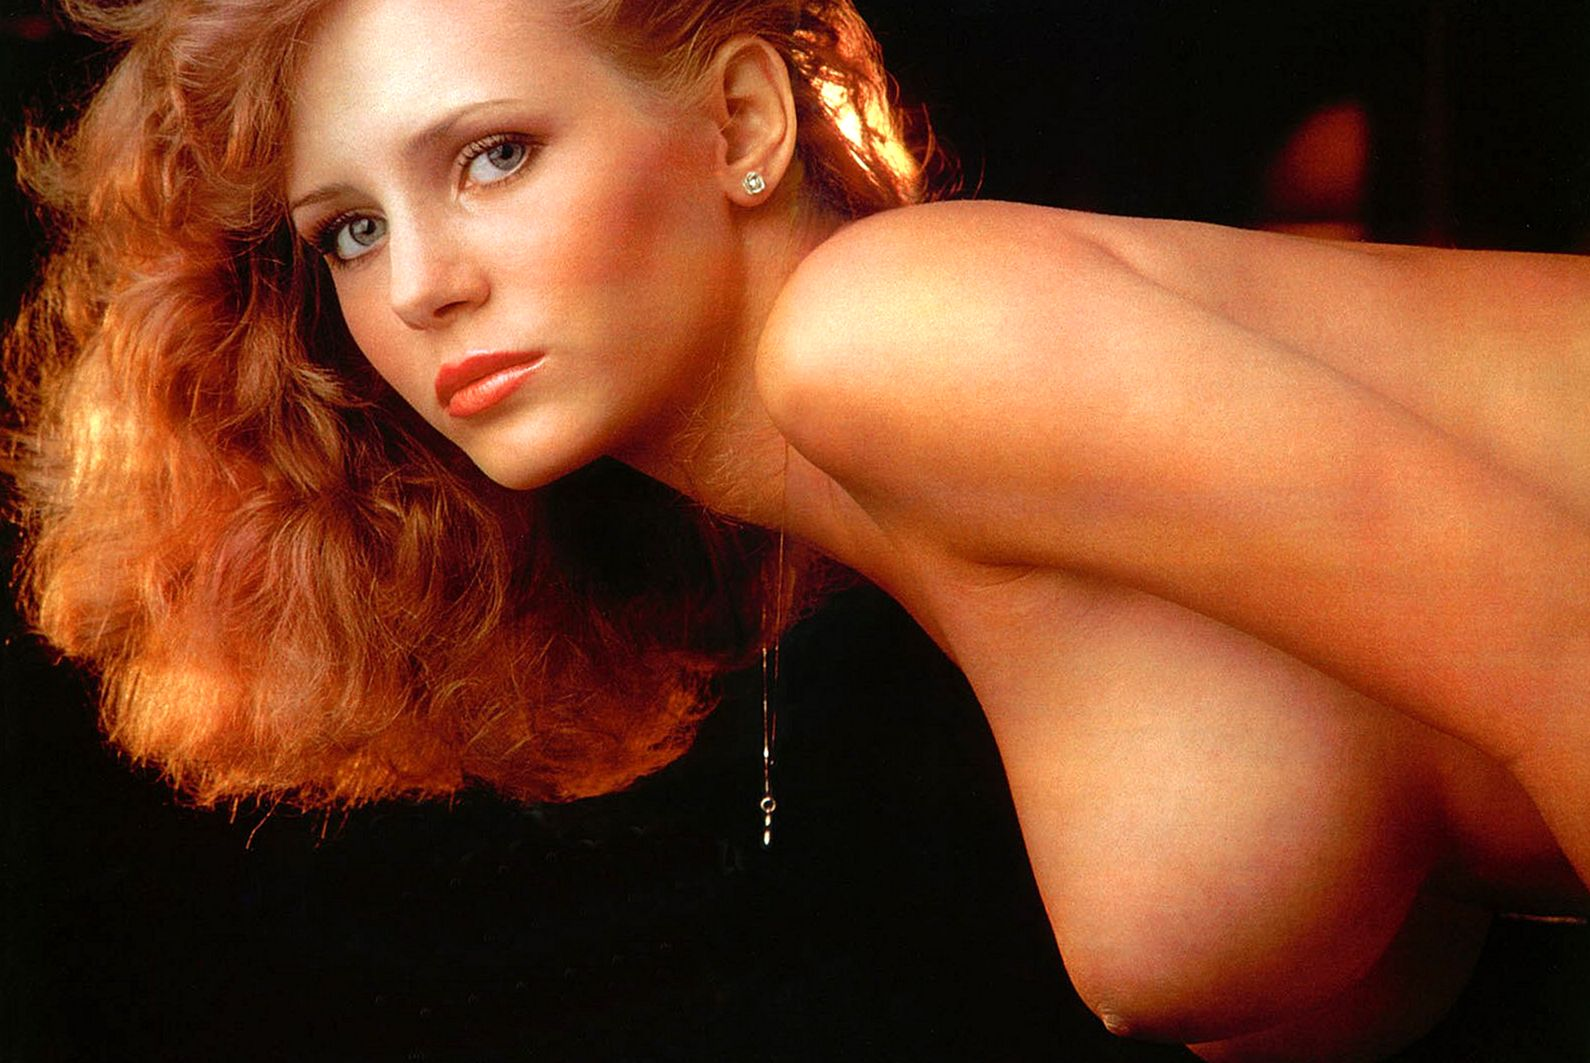 Kimberly McArthur – Playboy of January 1982